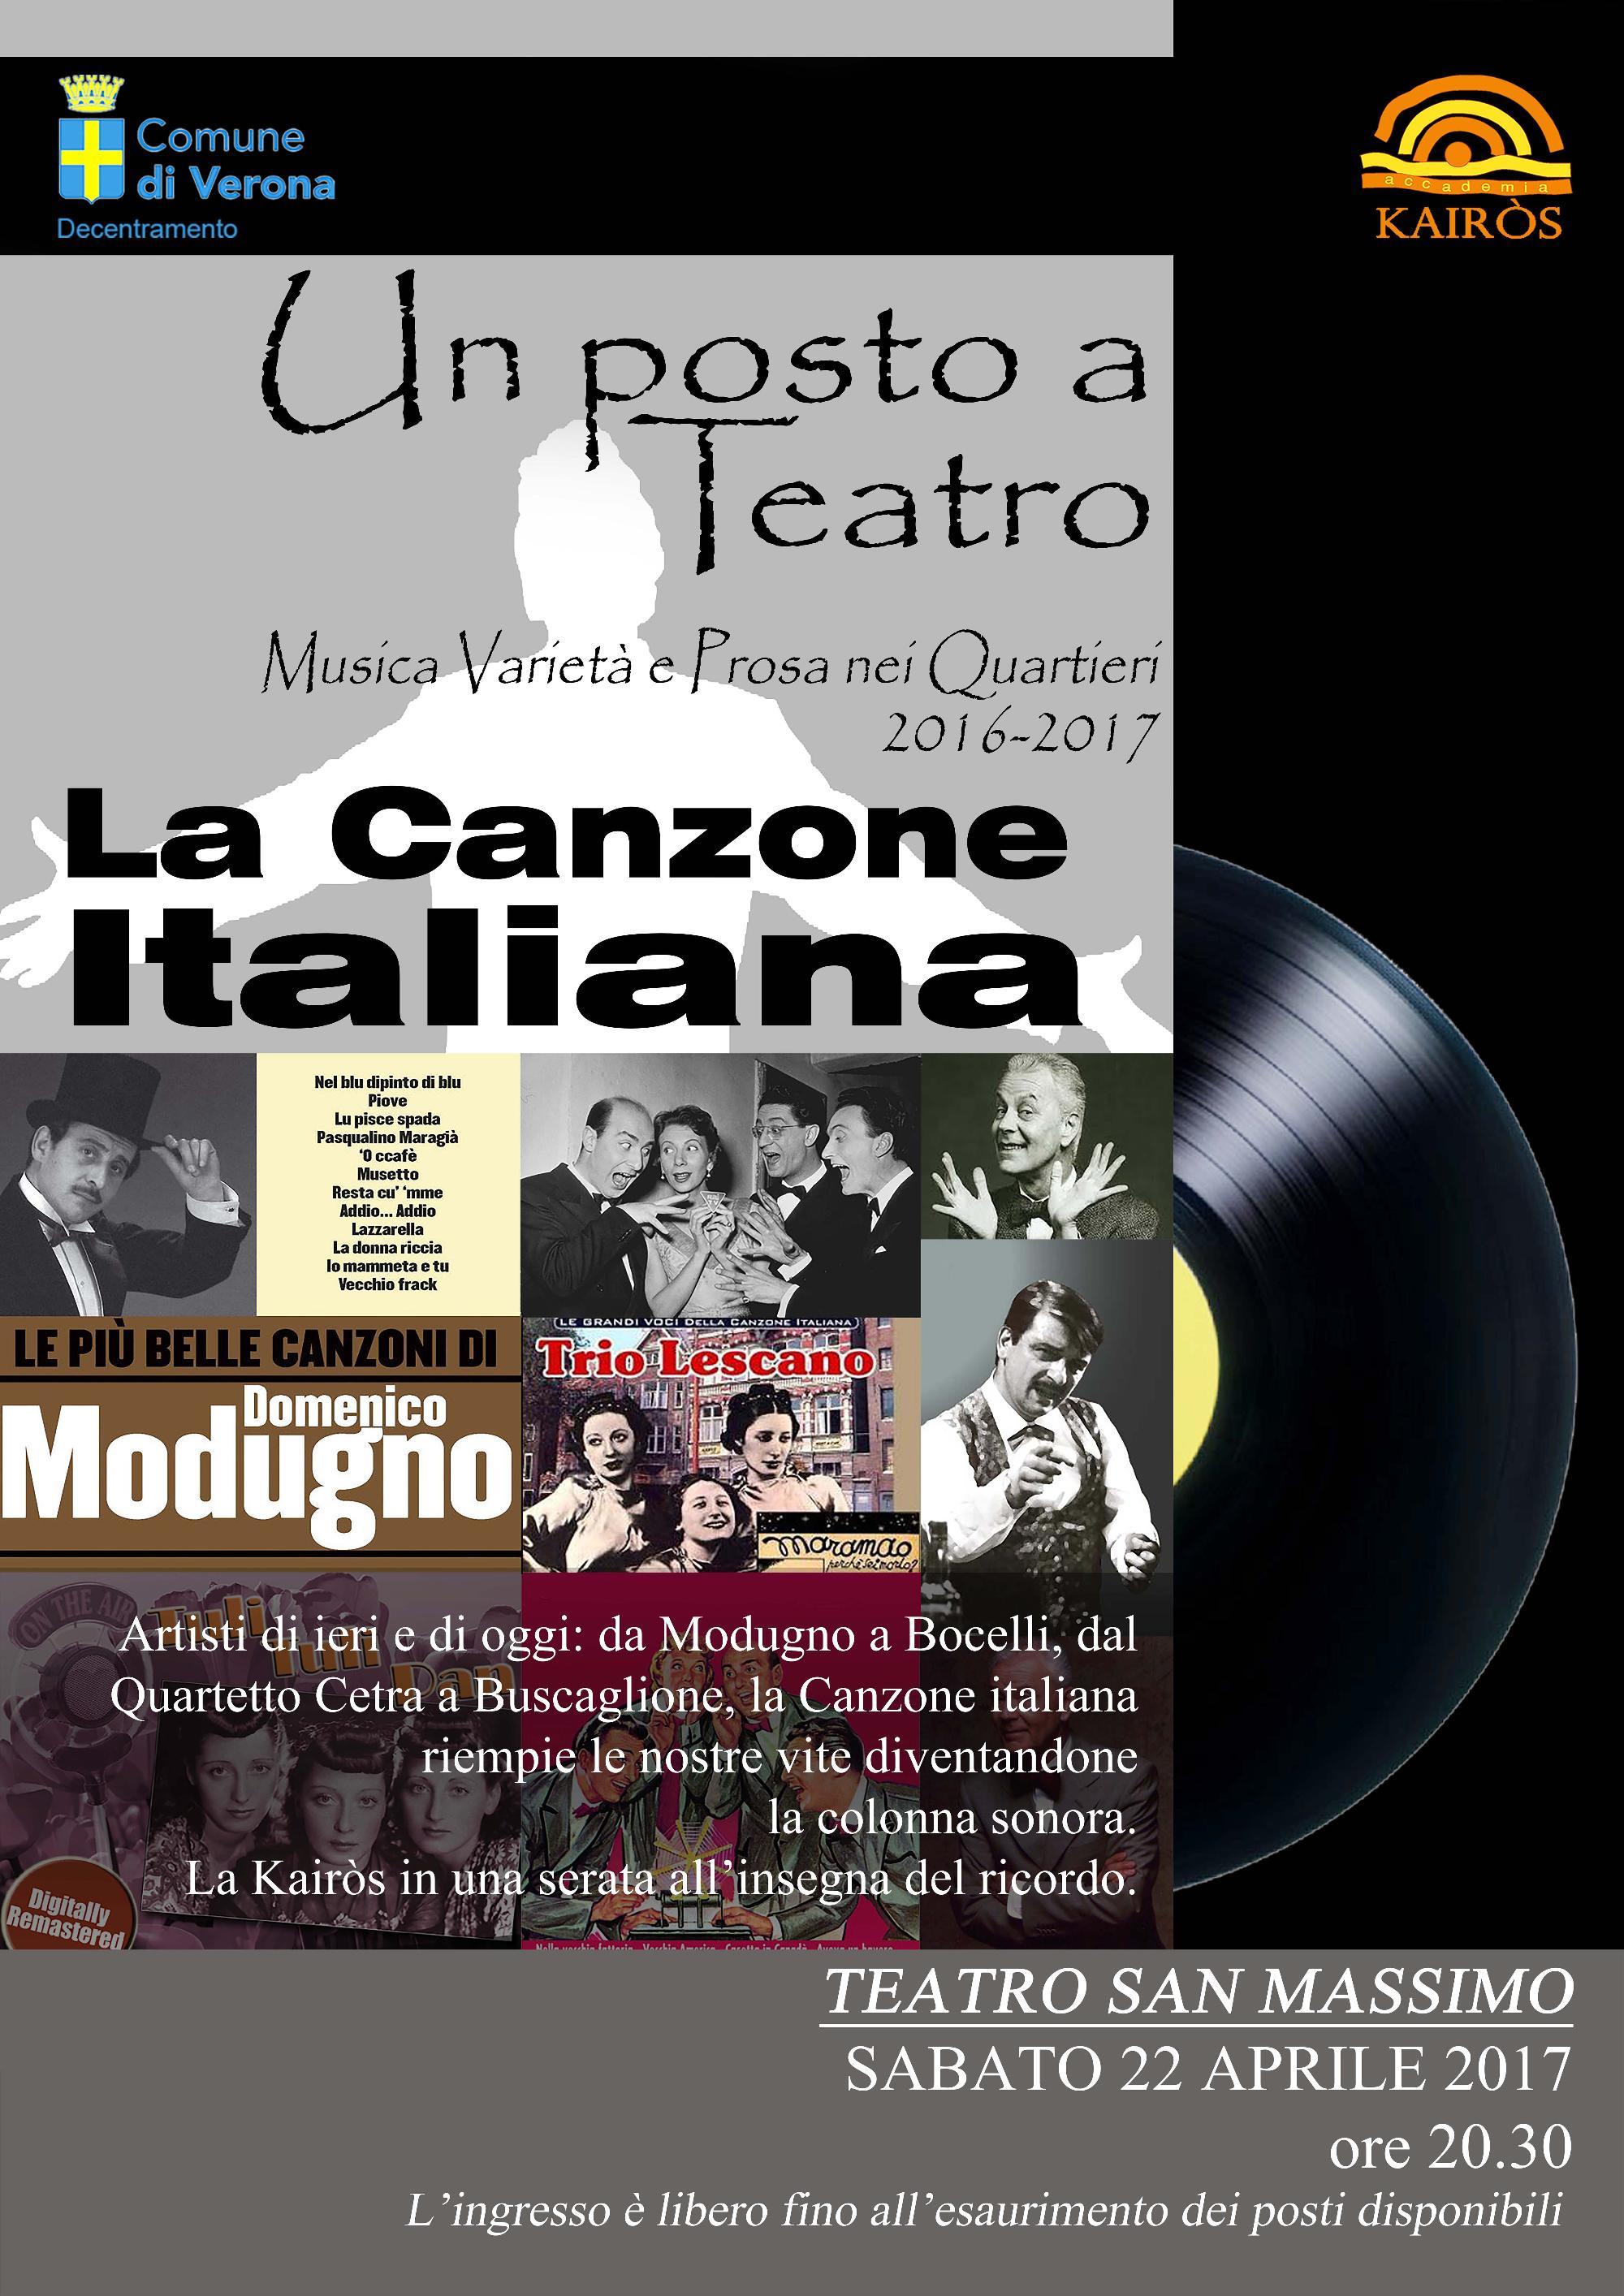 La Canzone Italiana [www.imagesplitter.net]